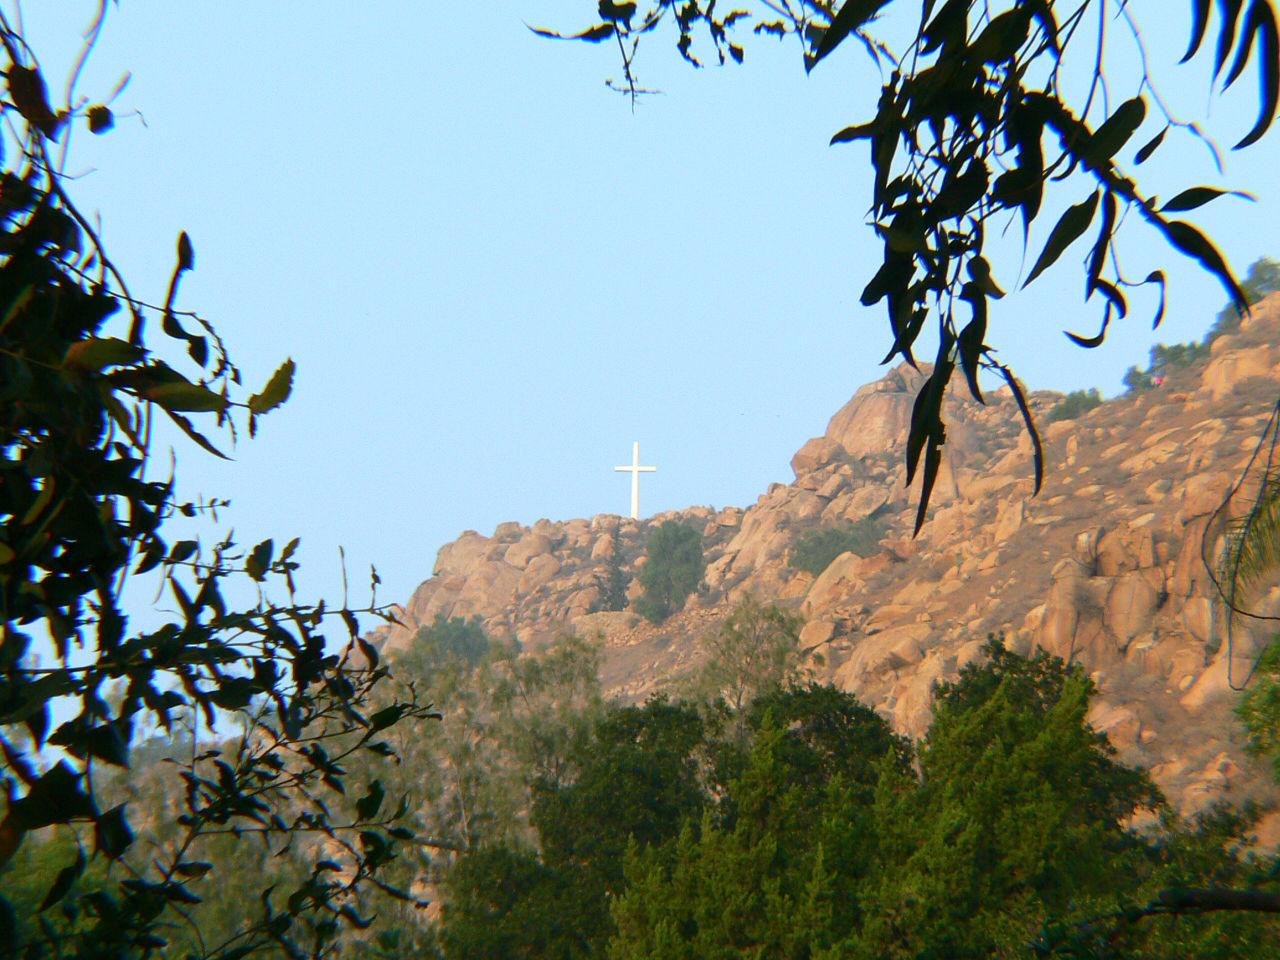 Commanding view of the Mt. Rubidoux cross.